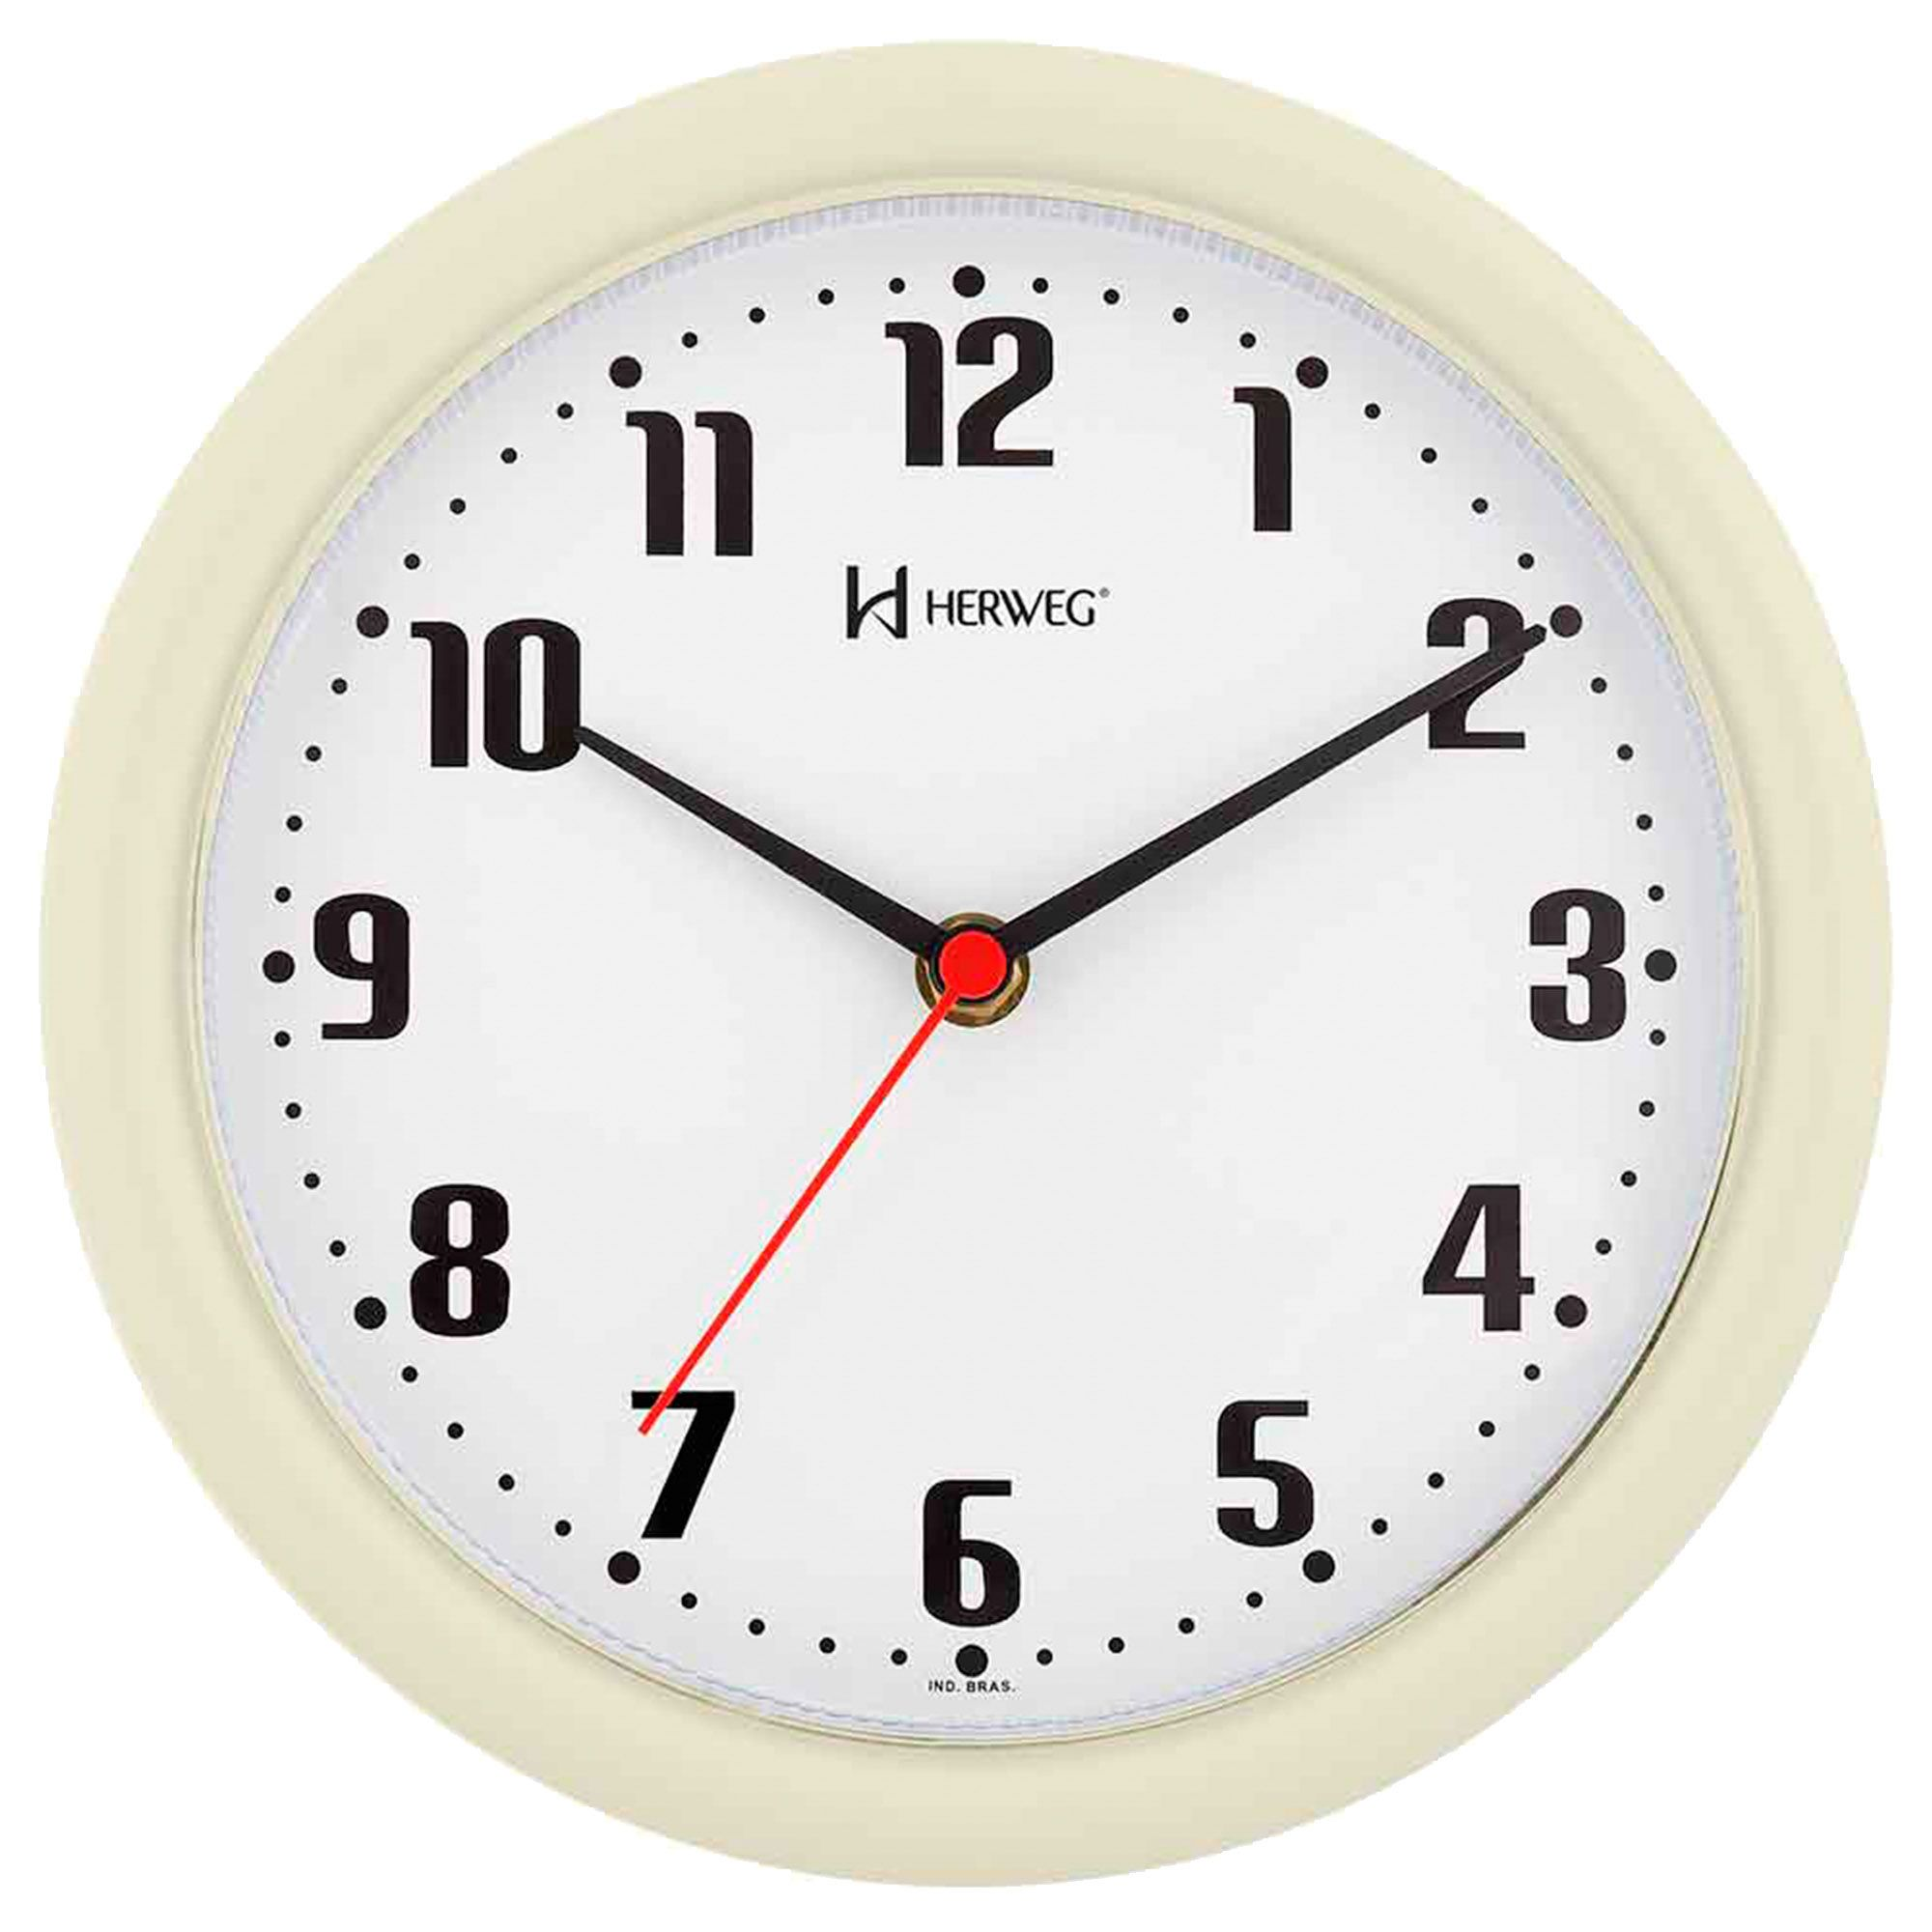 Relógio de Parede Analógico Herweg 6102 032 Marfim